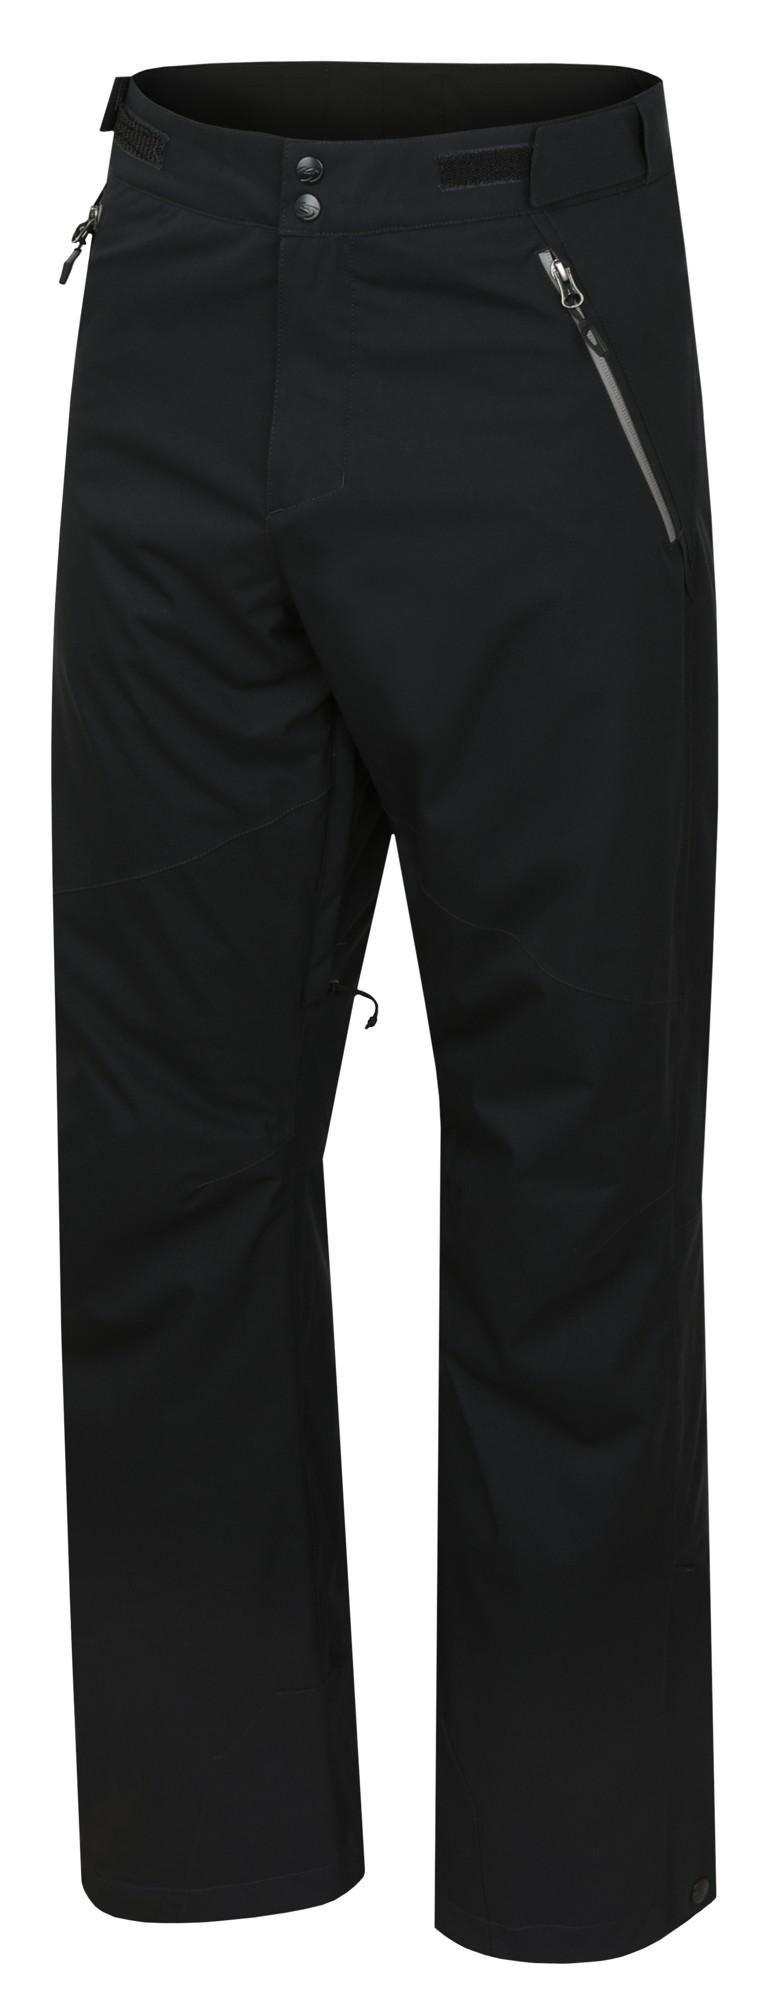 Pantaloni schi barbati Hannah Park Antracit imagine